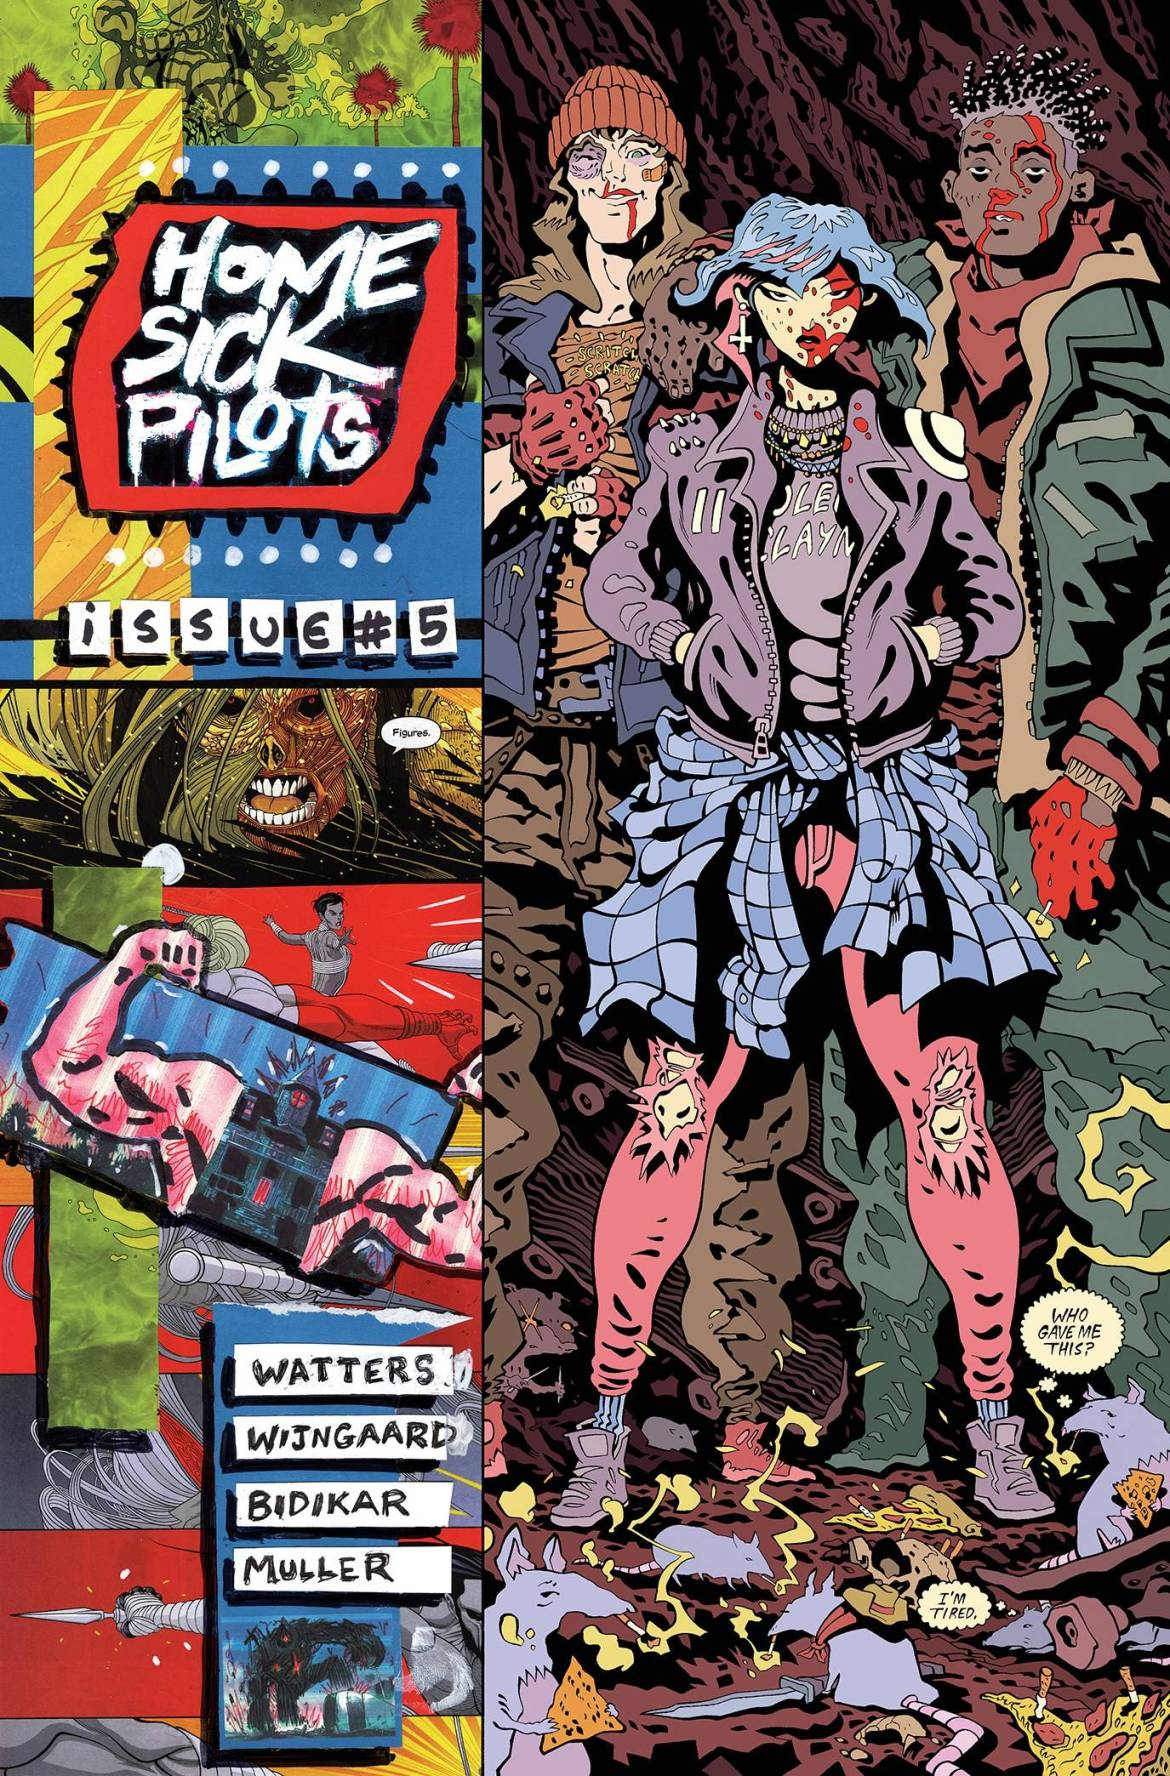 STL189267 ComicList: Image Comics New Releases for 04/14/2021